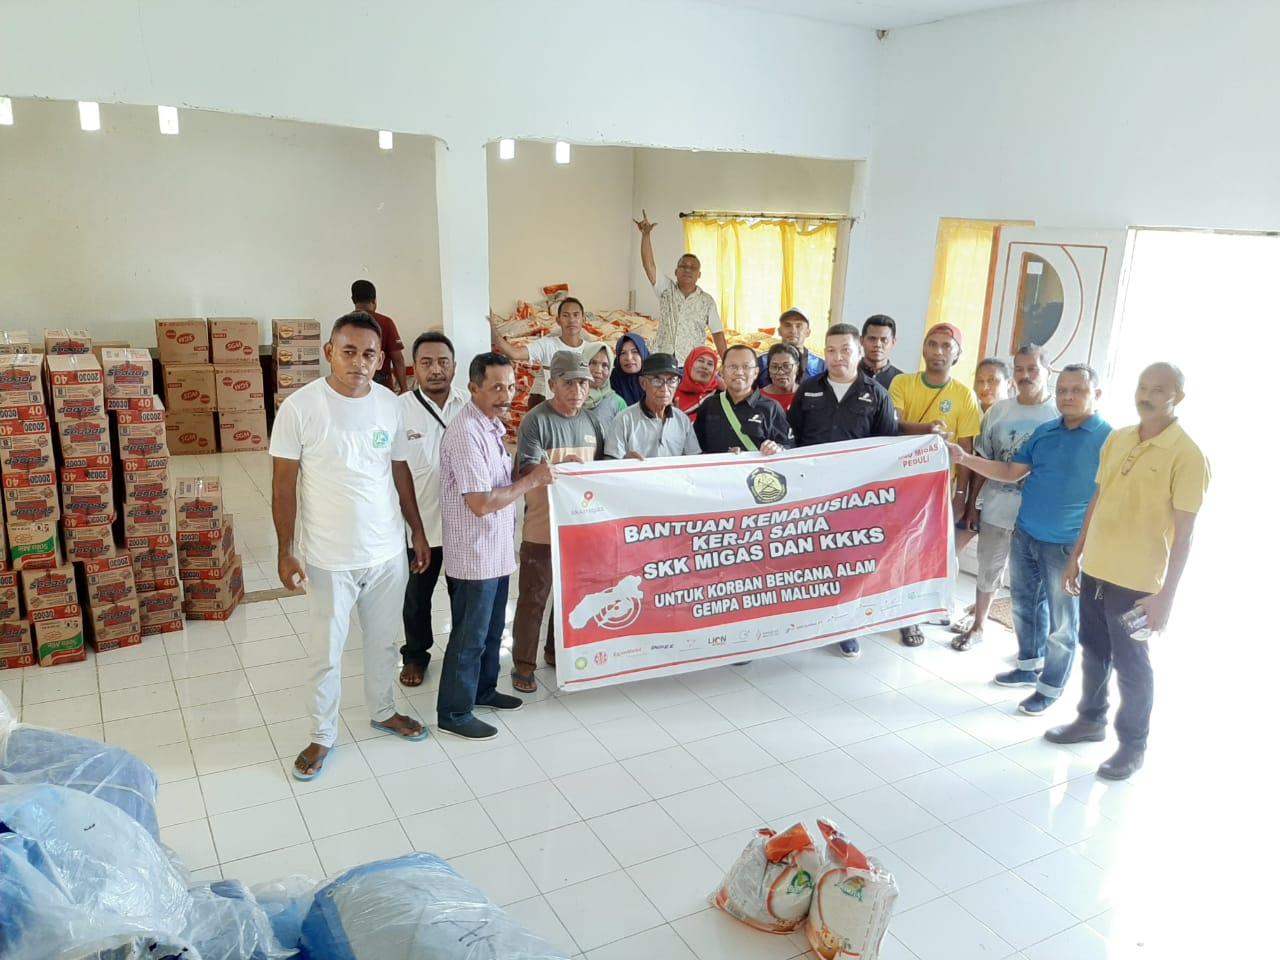 SKK Migas dan Kontraktor KKS Salurkan Bantuan untuk Warga Terdampak Gempa Maluku